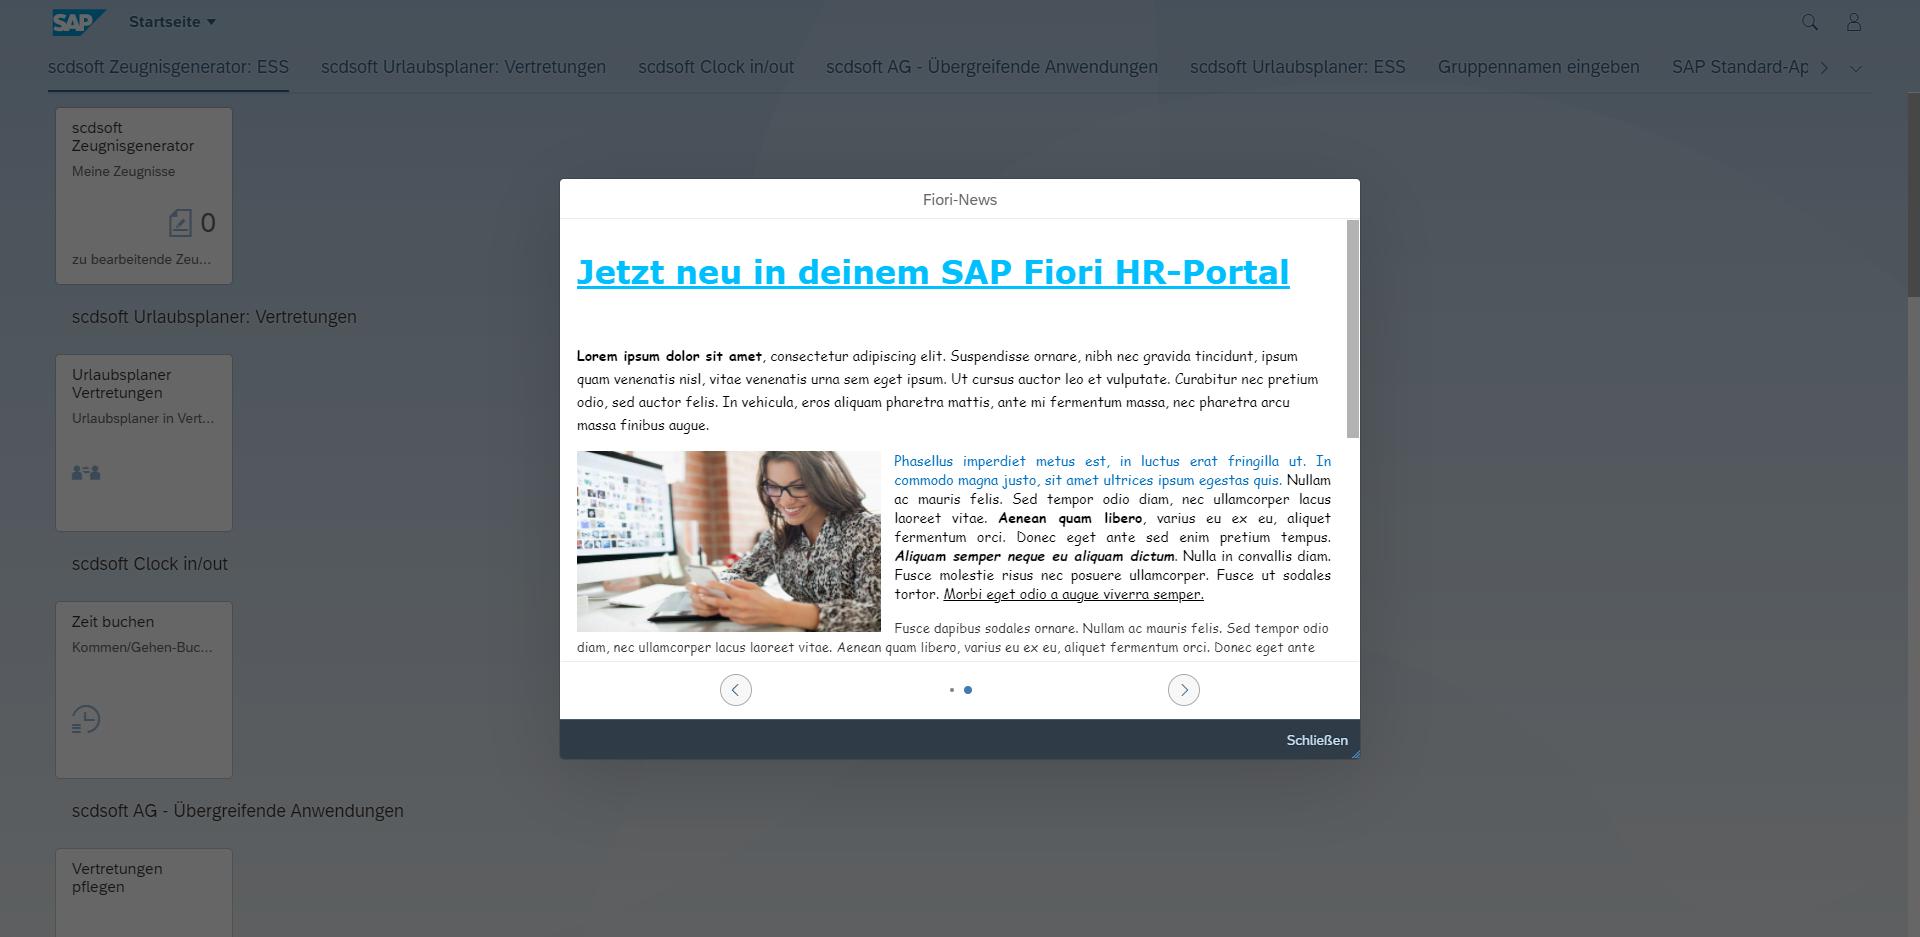 scdsoft Fiori Launchpad News App